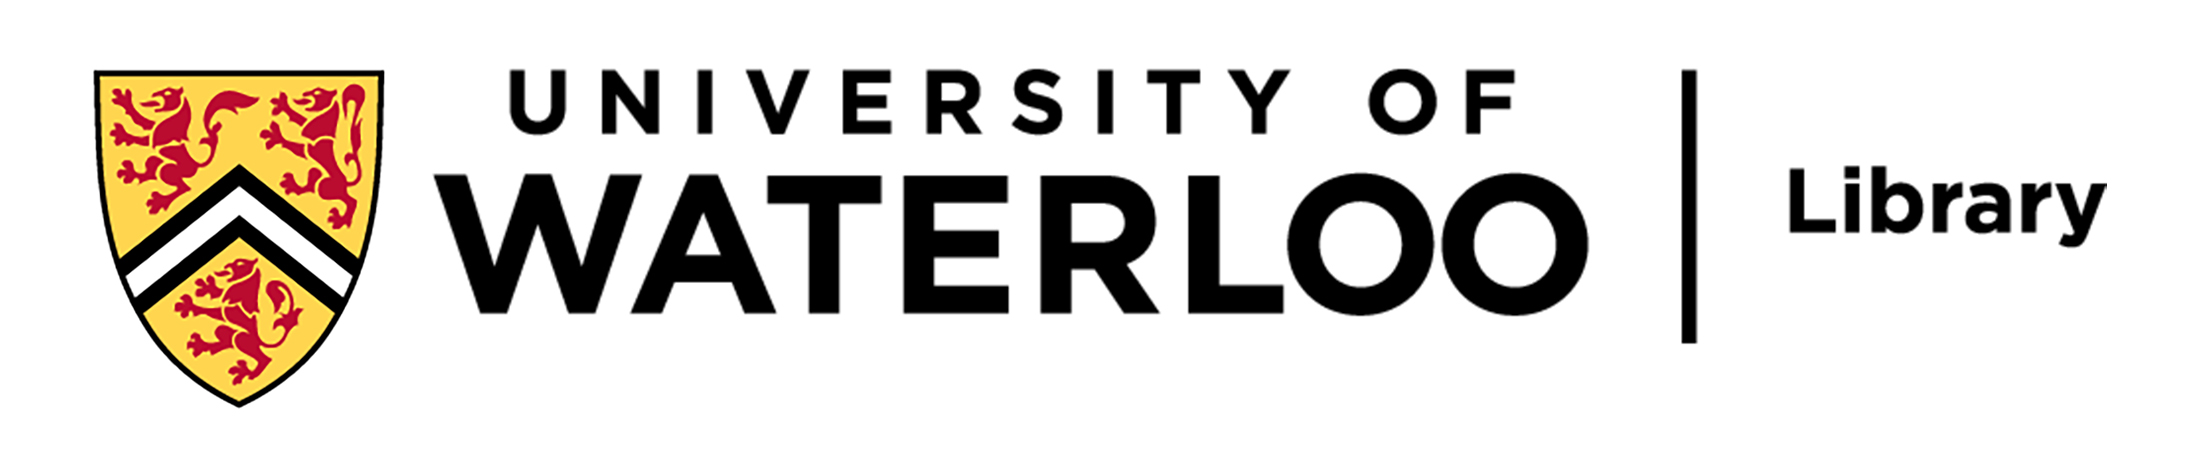 UWaterloo_Library_Logo_horiz_rgb.jpg